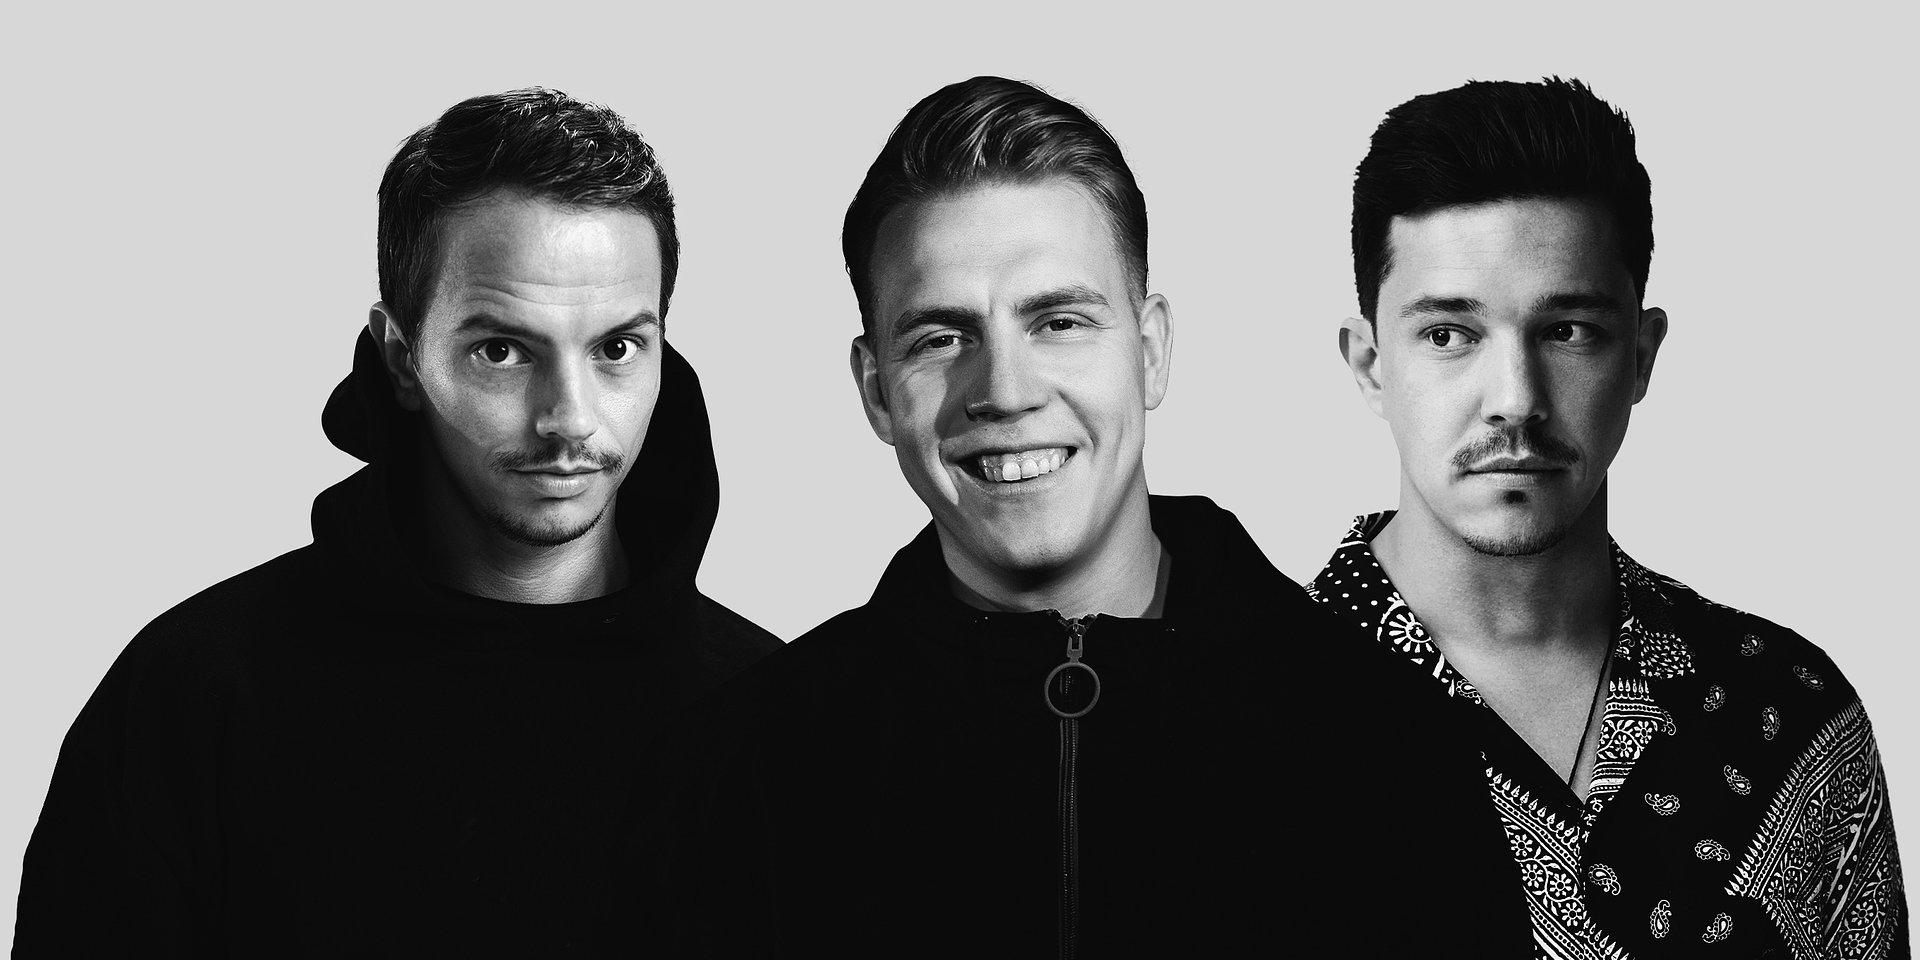 Martin Jensen, Alle Farben i Nico Santos we wspólnym singlu